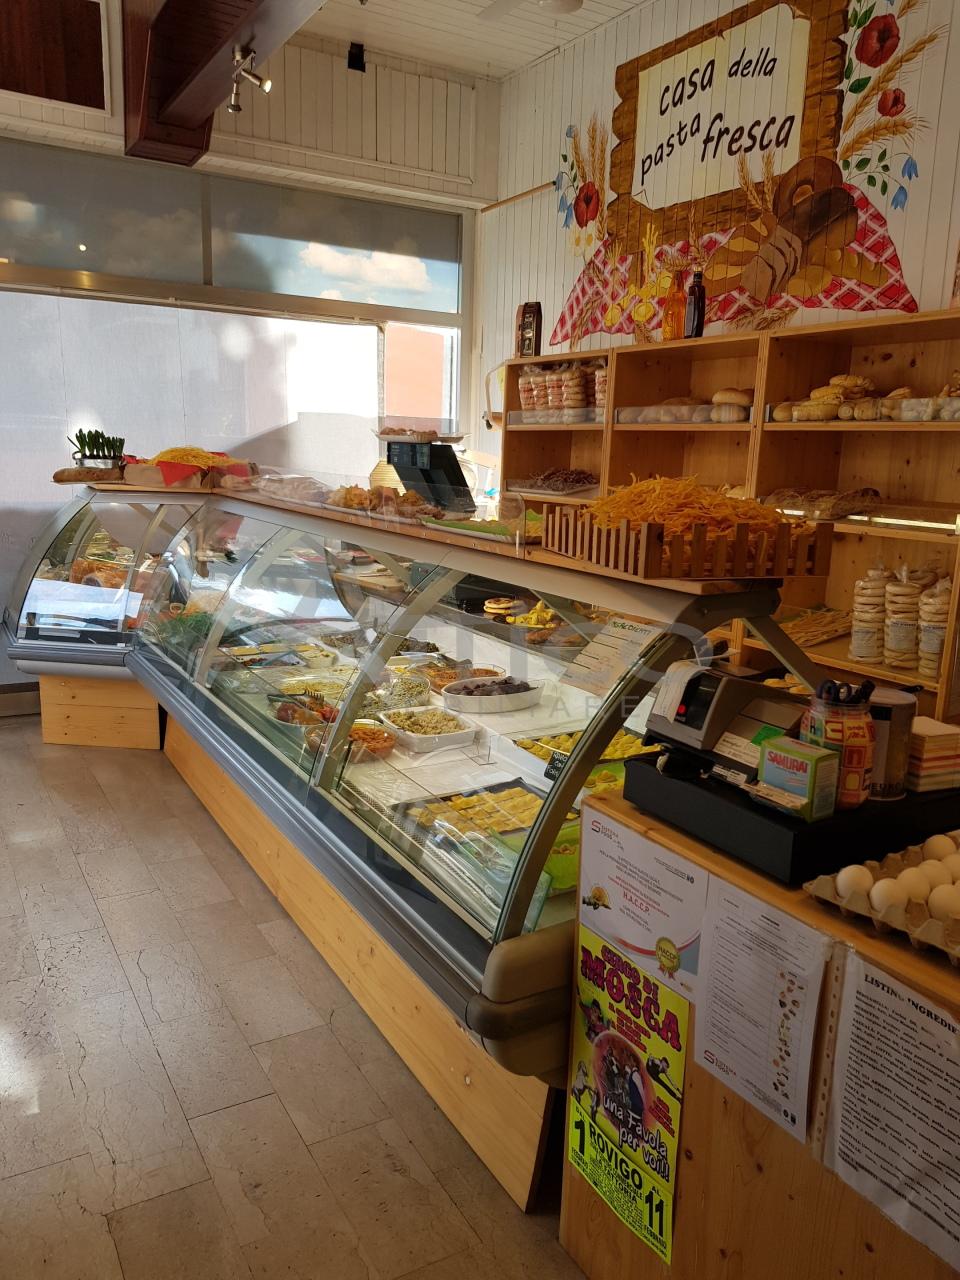 Gastronomia a Centro città, Rovigo Rif. 9917879